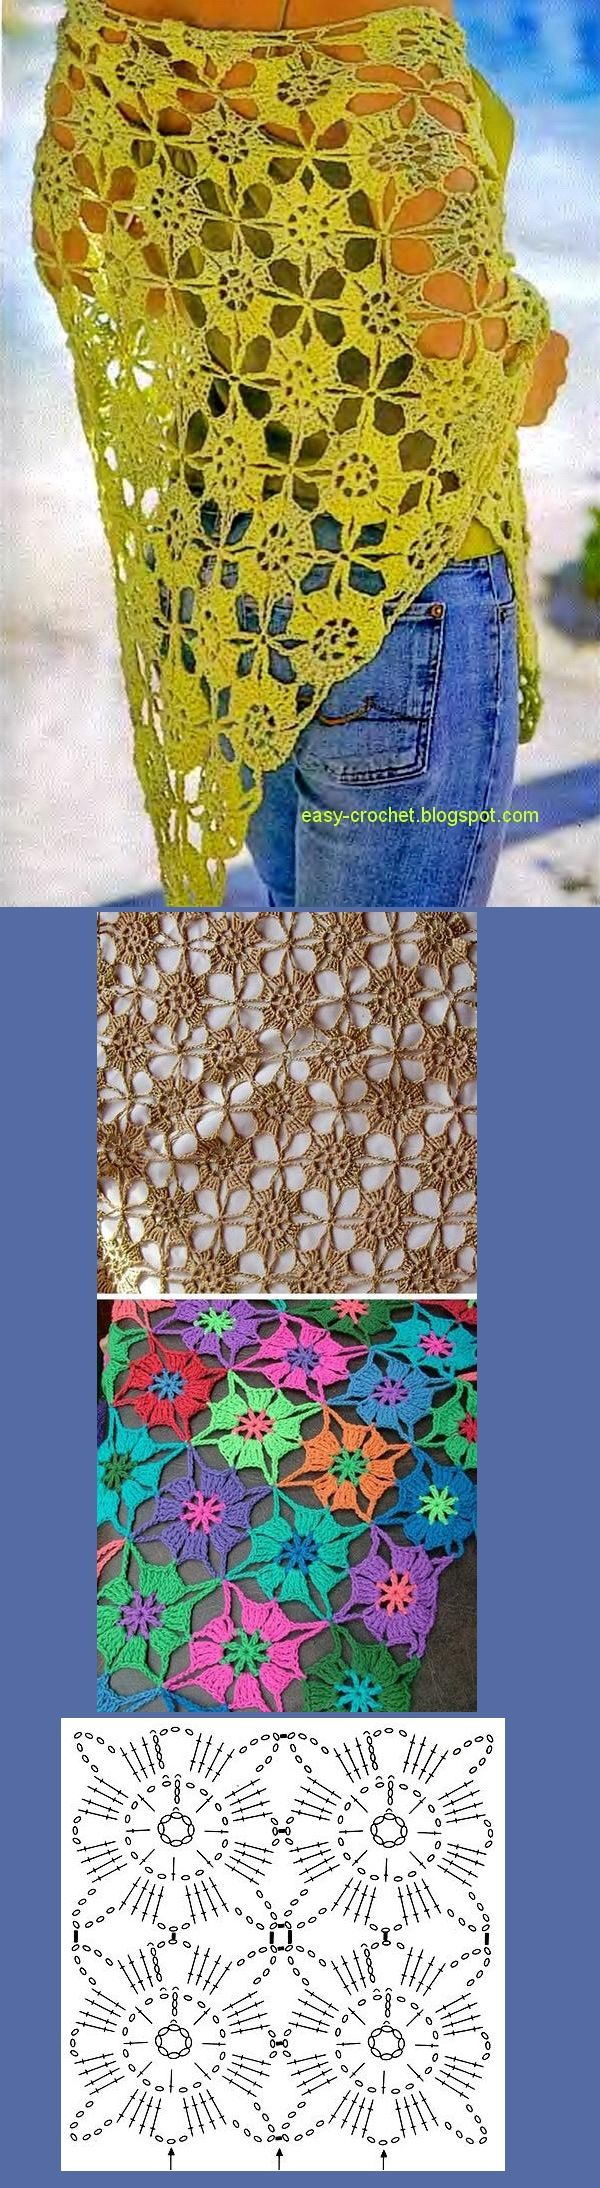 Crochet Shawl with its diagram   Accesorios Crochet   Pinterest ...